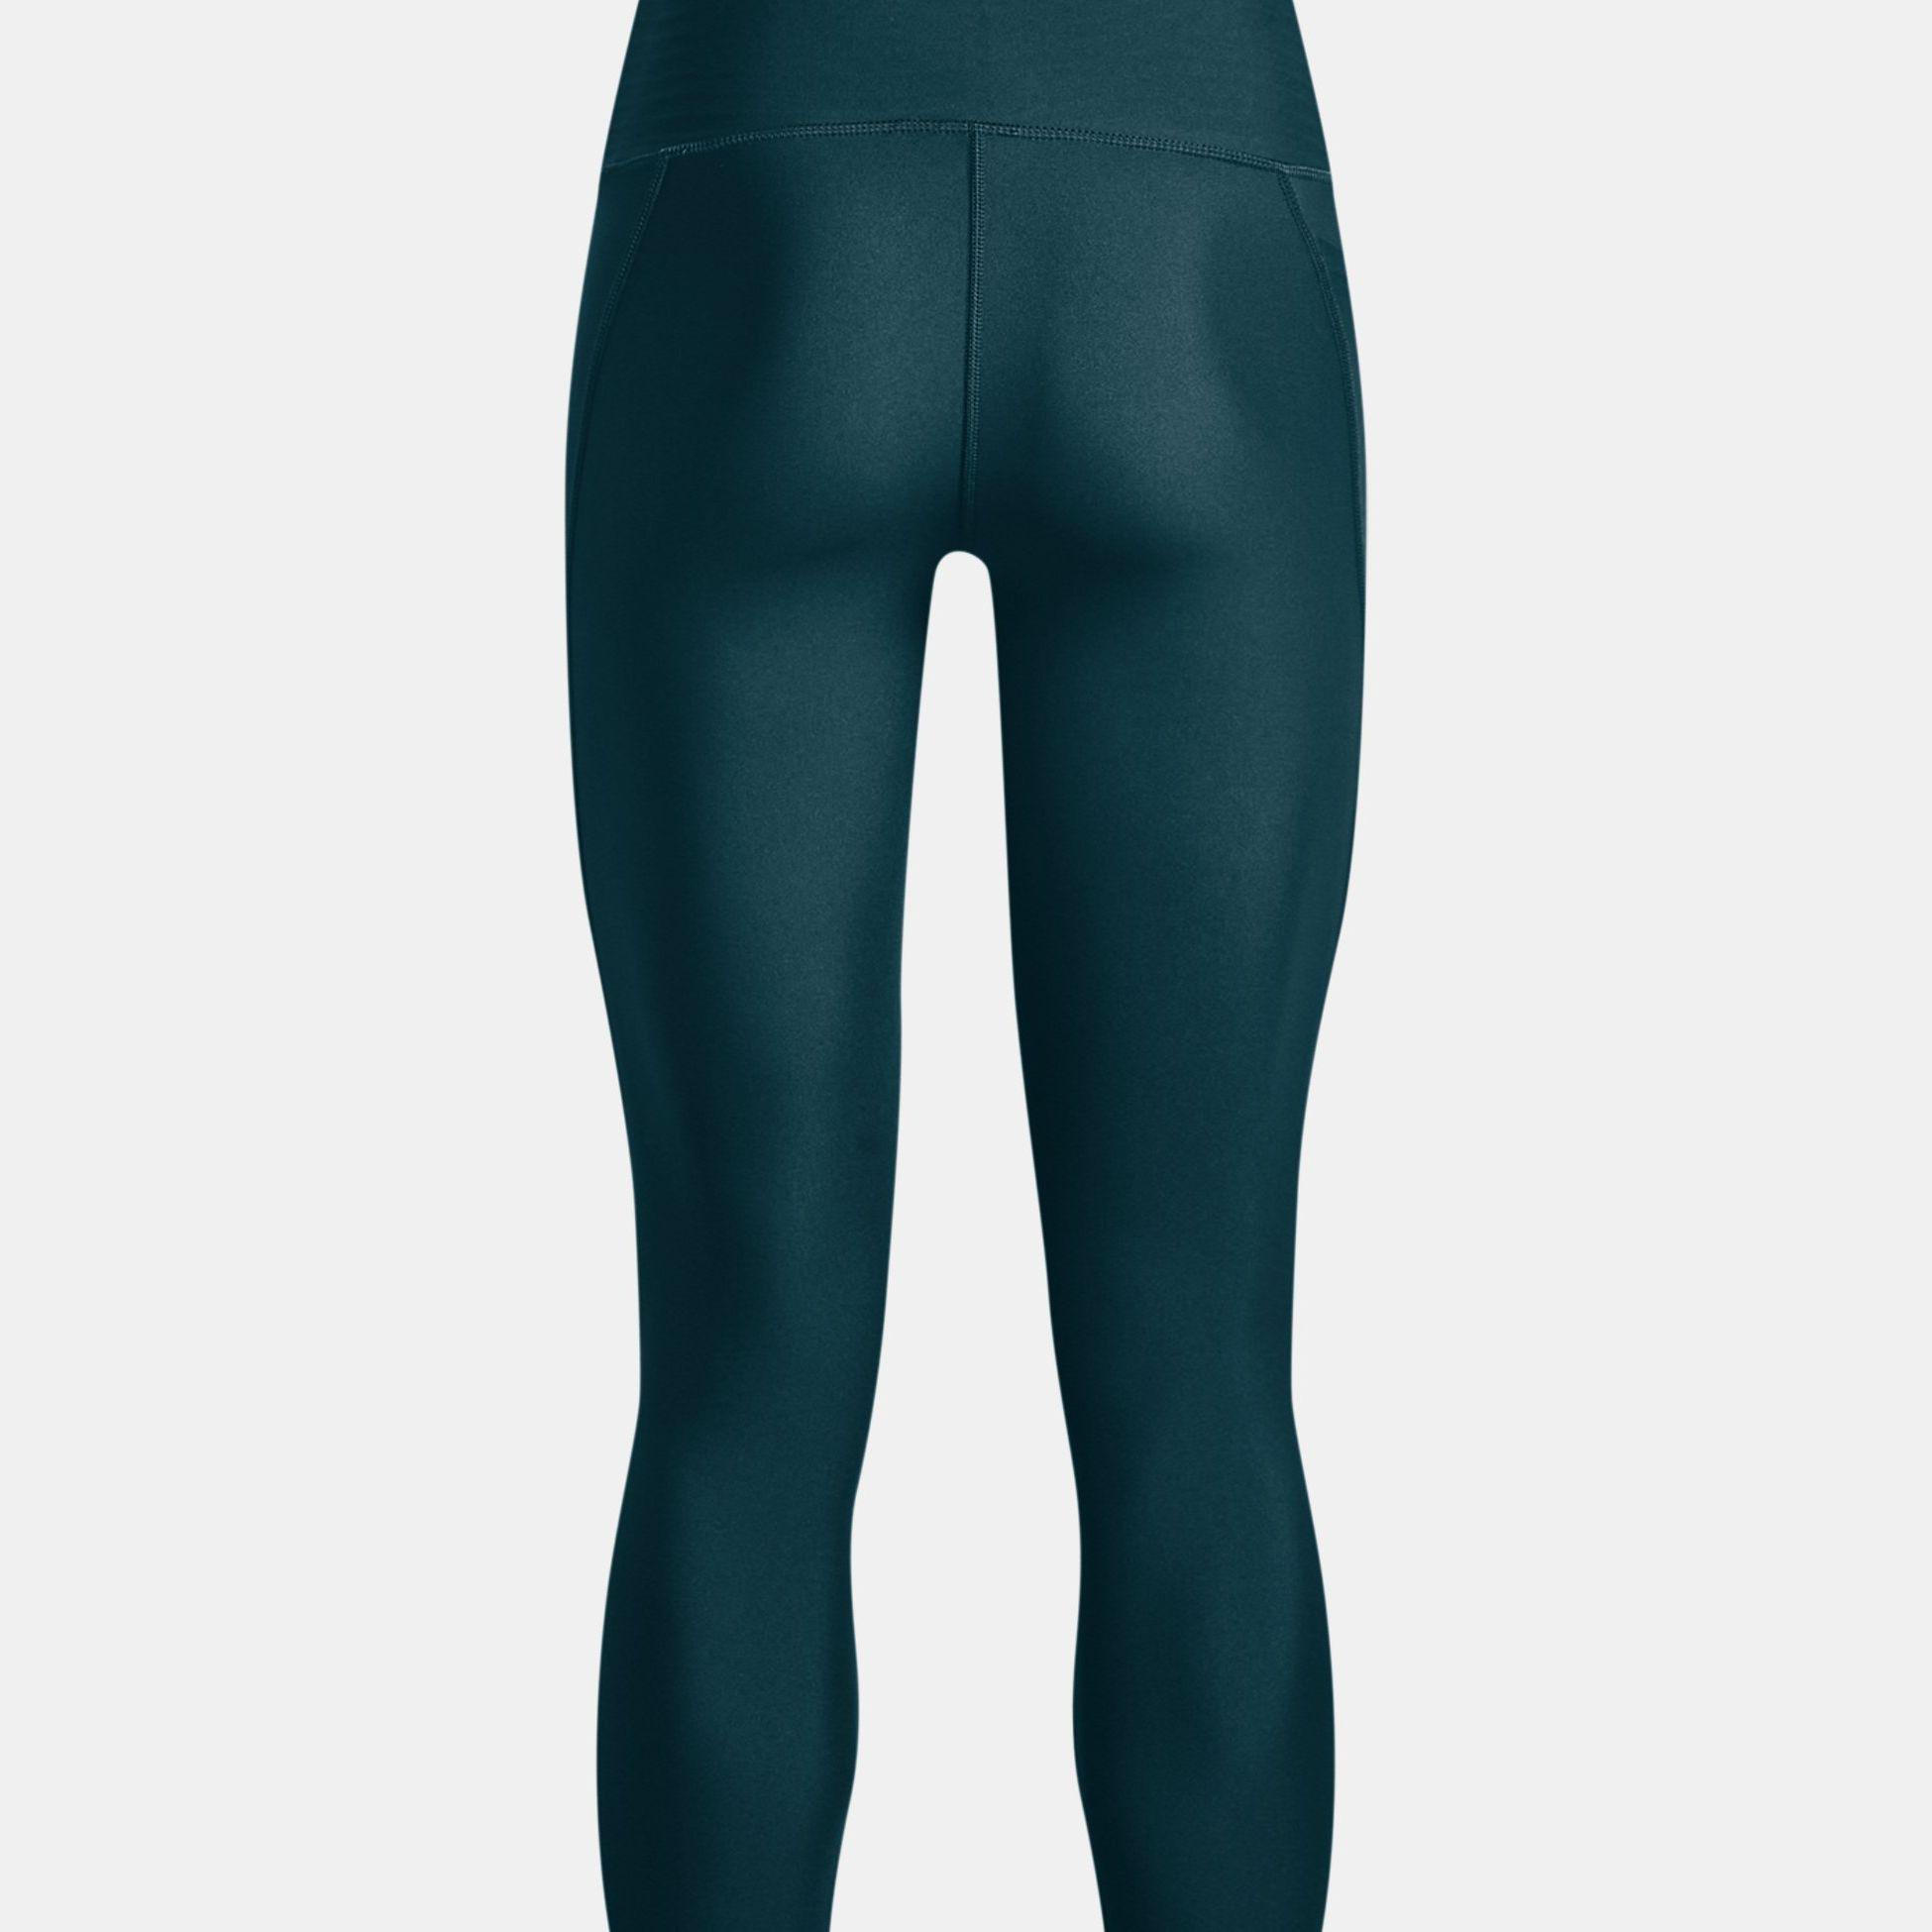 Îmbrăcăminte -  under armour HeatGear Armour No-Slip Waistband Ankle Leggings